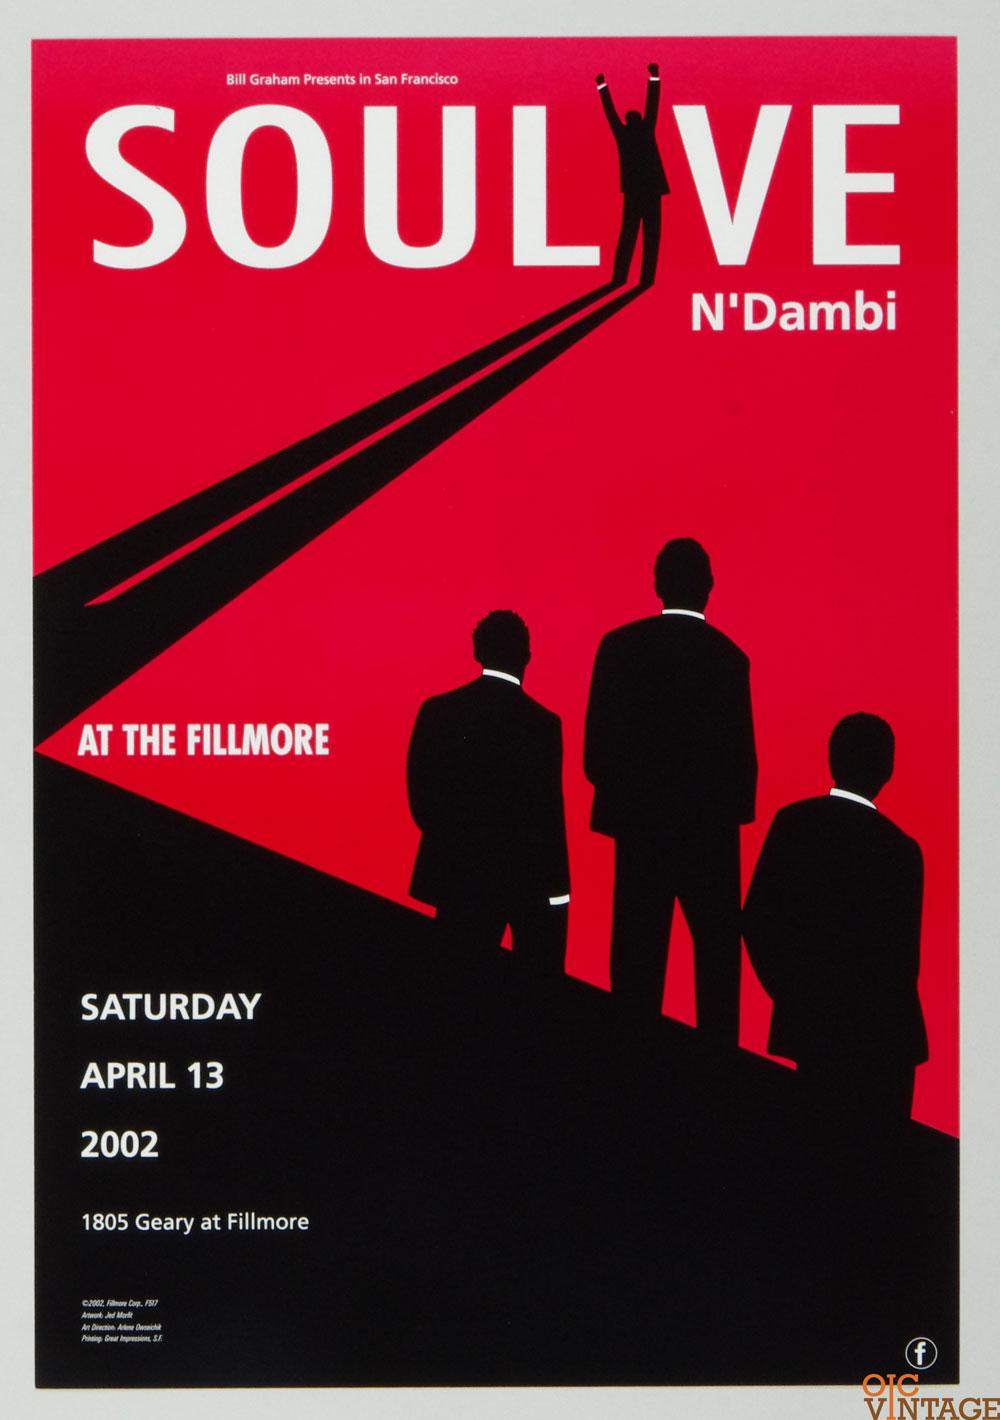 New Fillmore F517 Poster Soulove N'ambi 2002 Apr 13